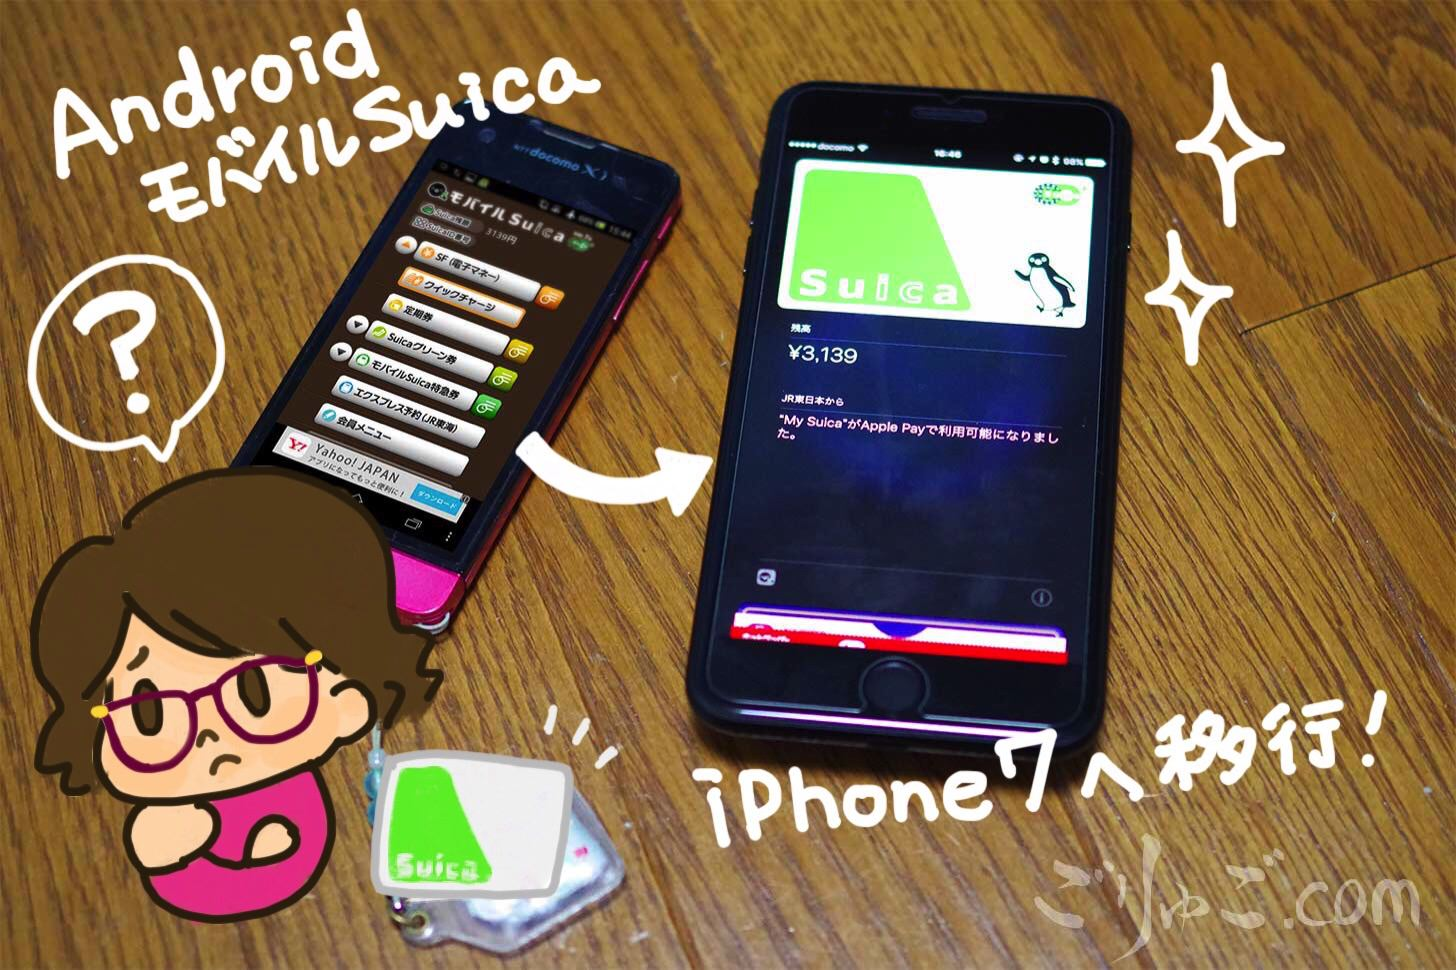 IPhone7へモバイルSuica移行